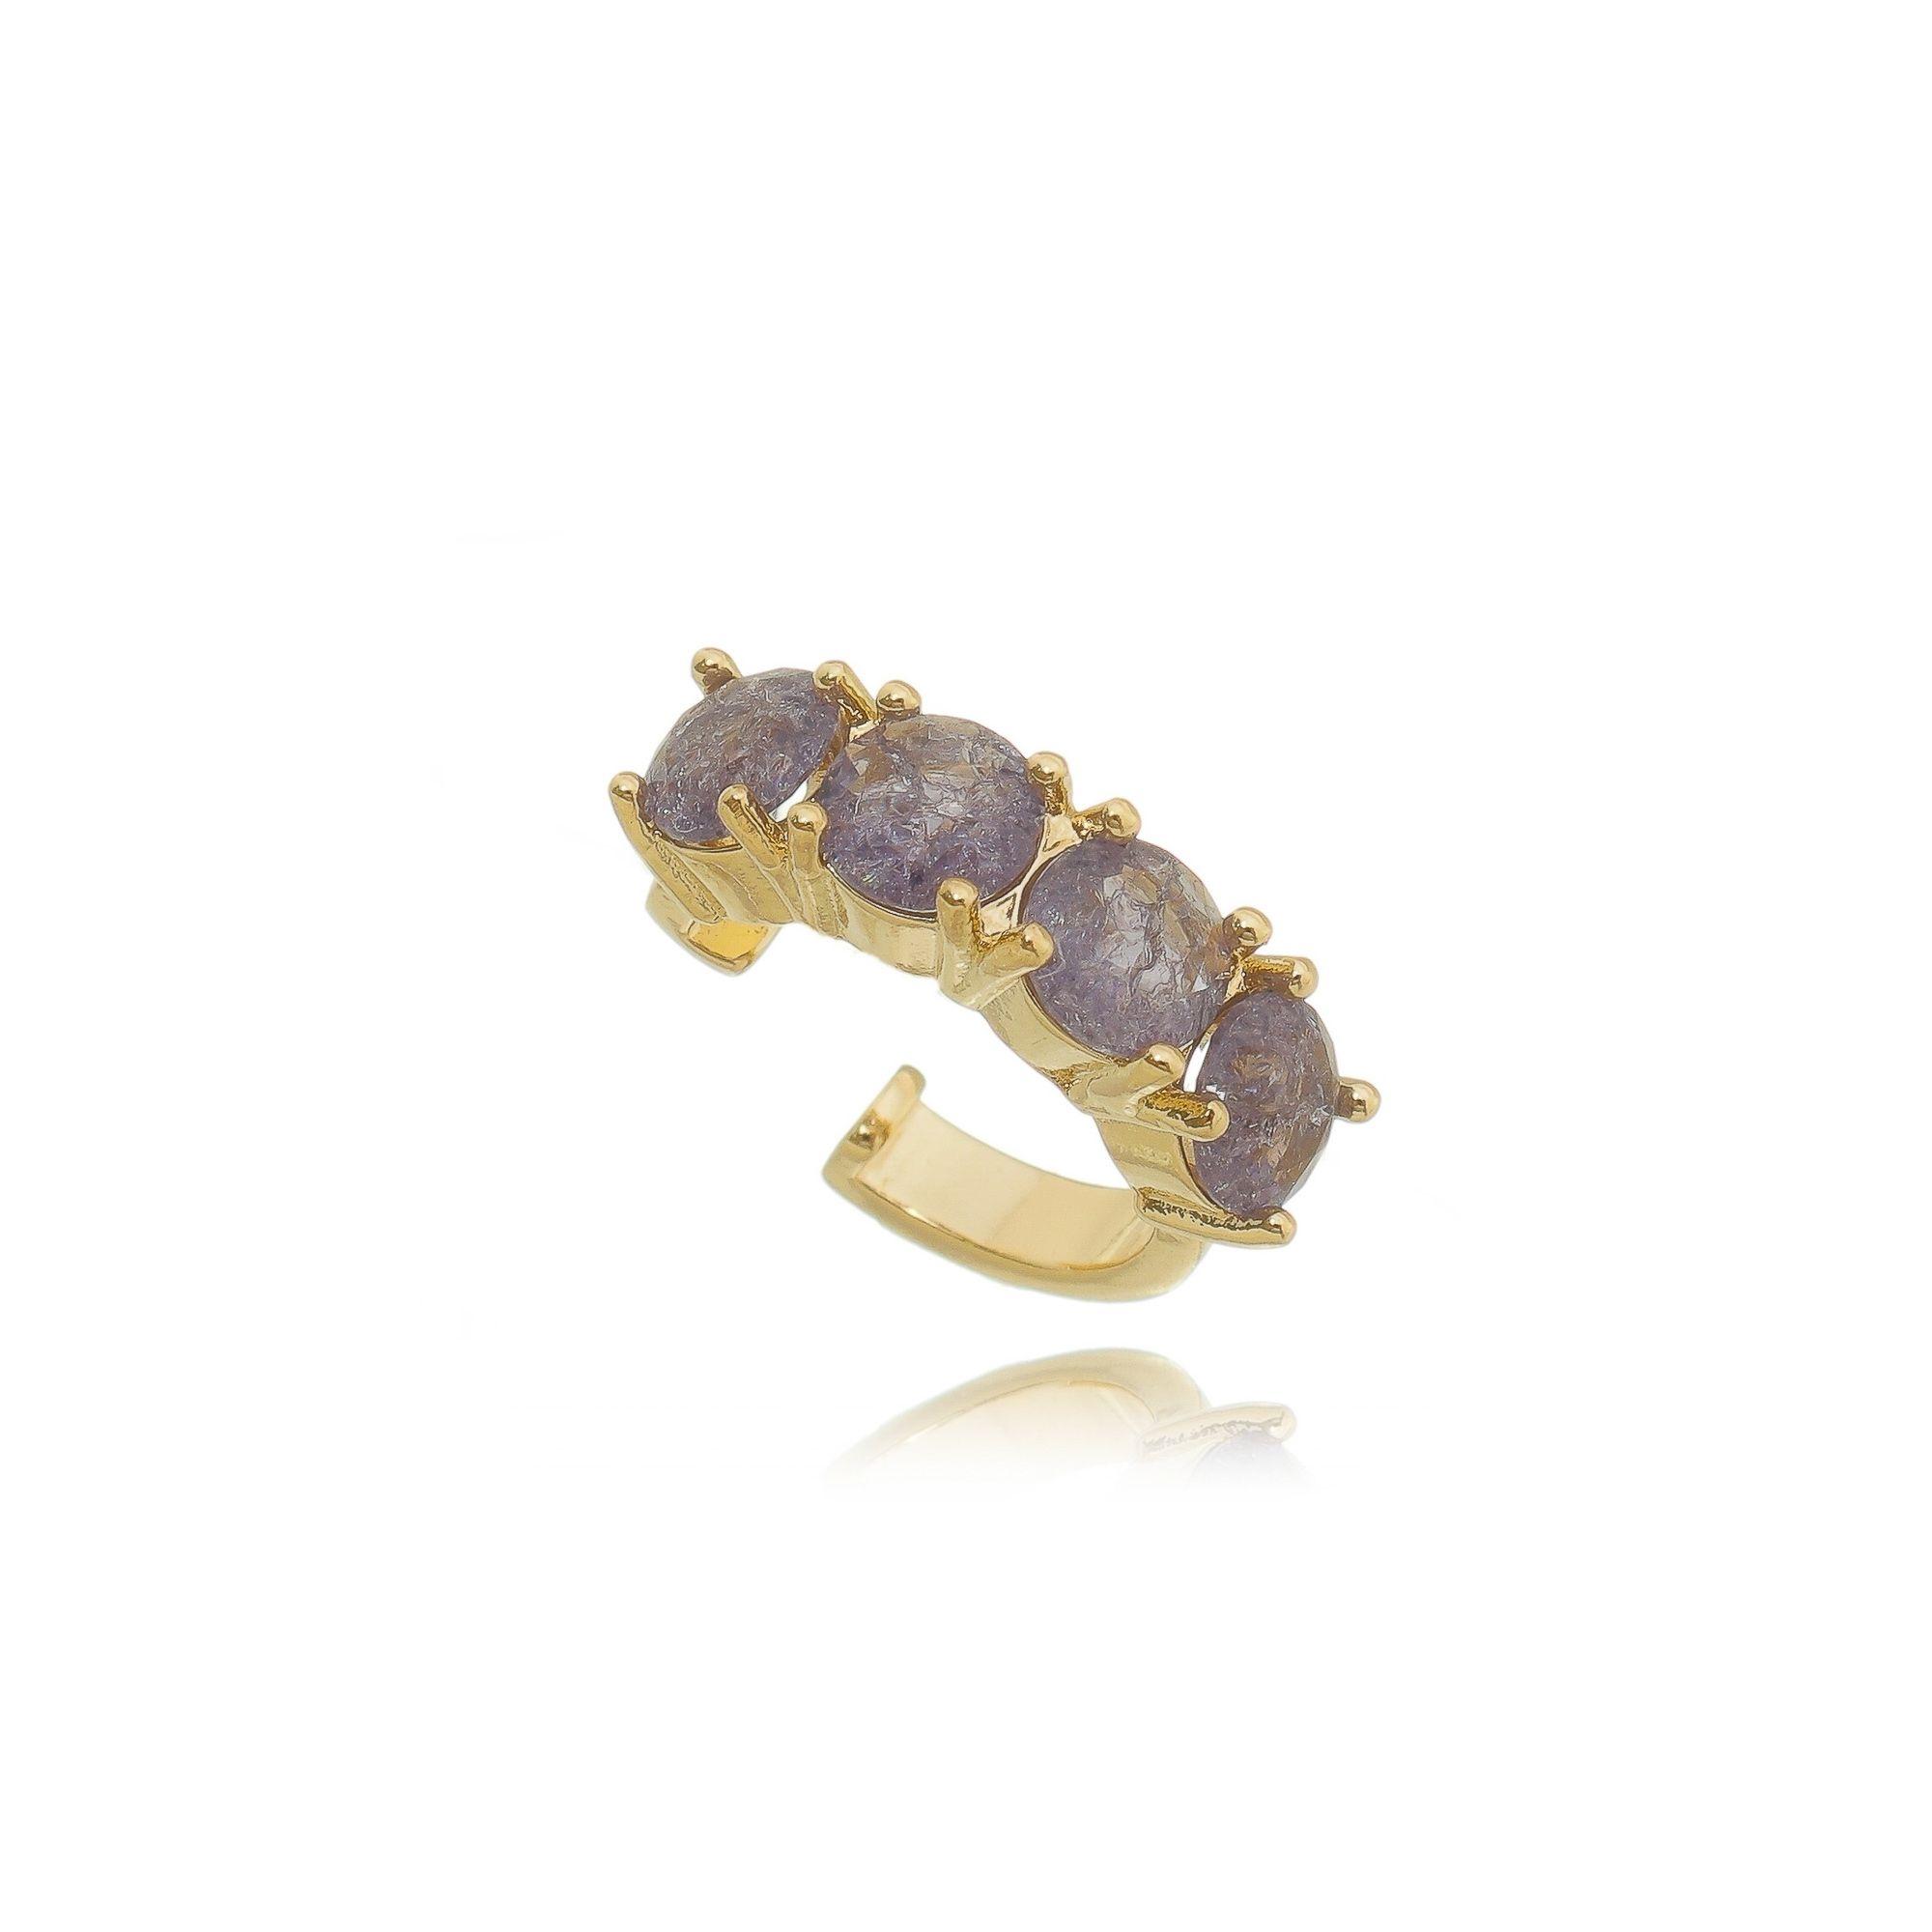 Fake Piercing Pedra Fusion Tanzanita Semijoia em Ouro 18K  - Soloyou